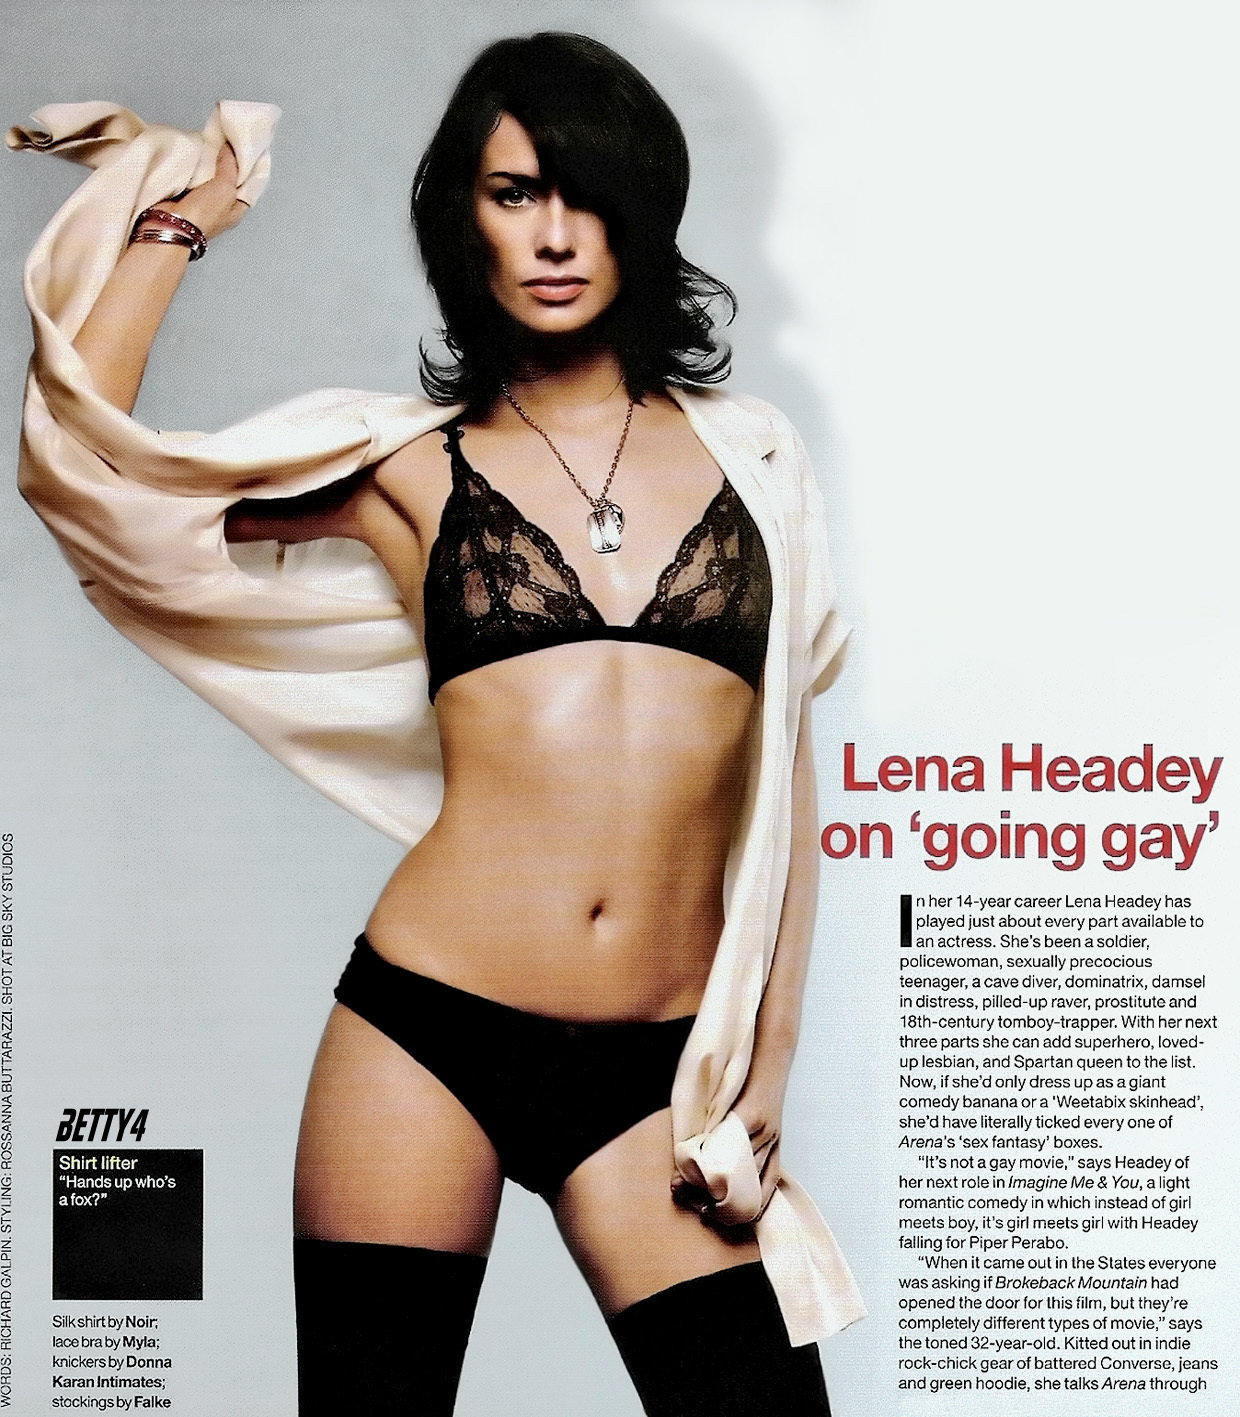 Game of Thrones /სამეფო კარის თამაში  - Page 22 Lena-lena-headey-2725815-1240-1417